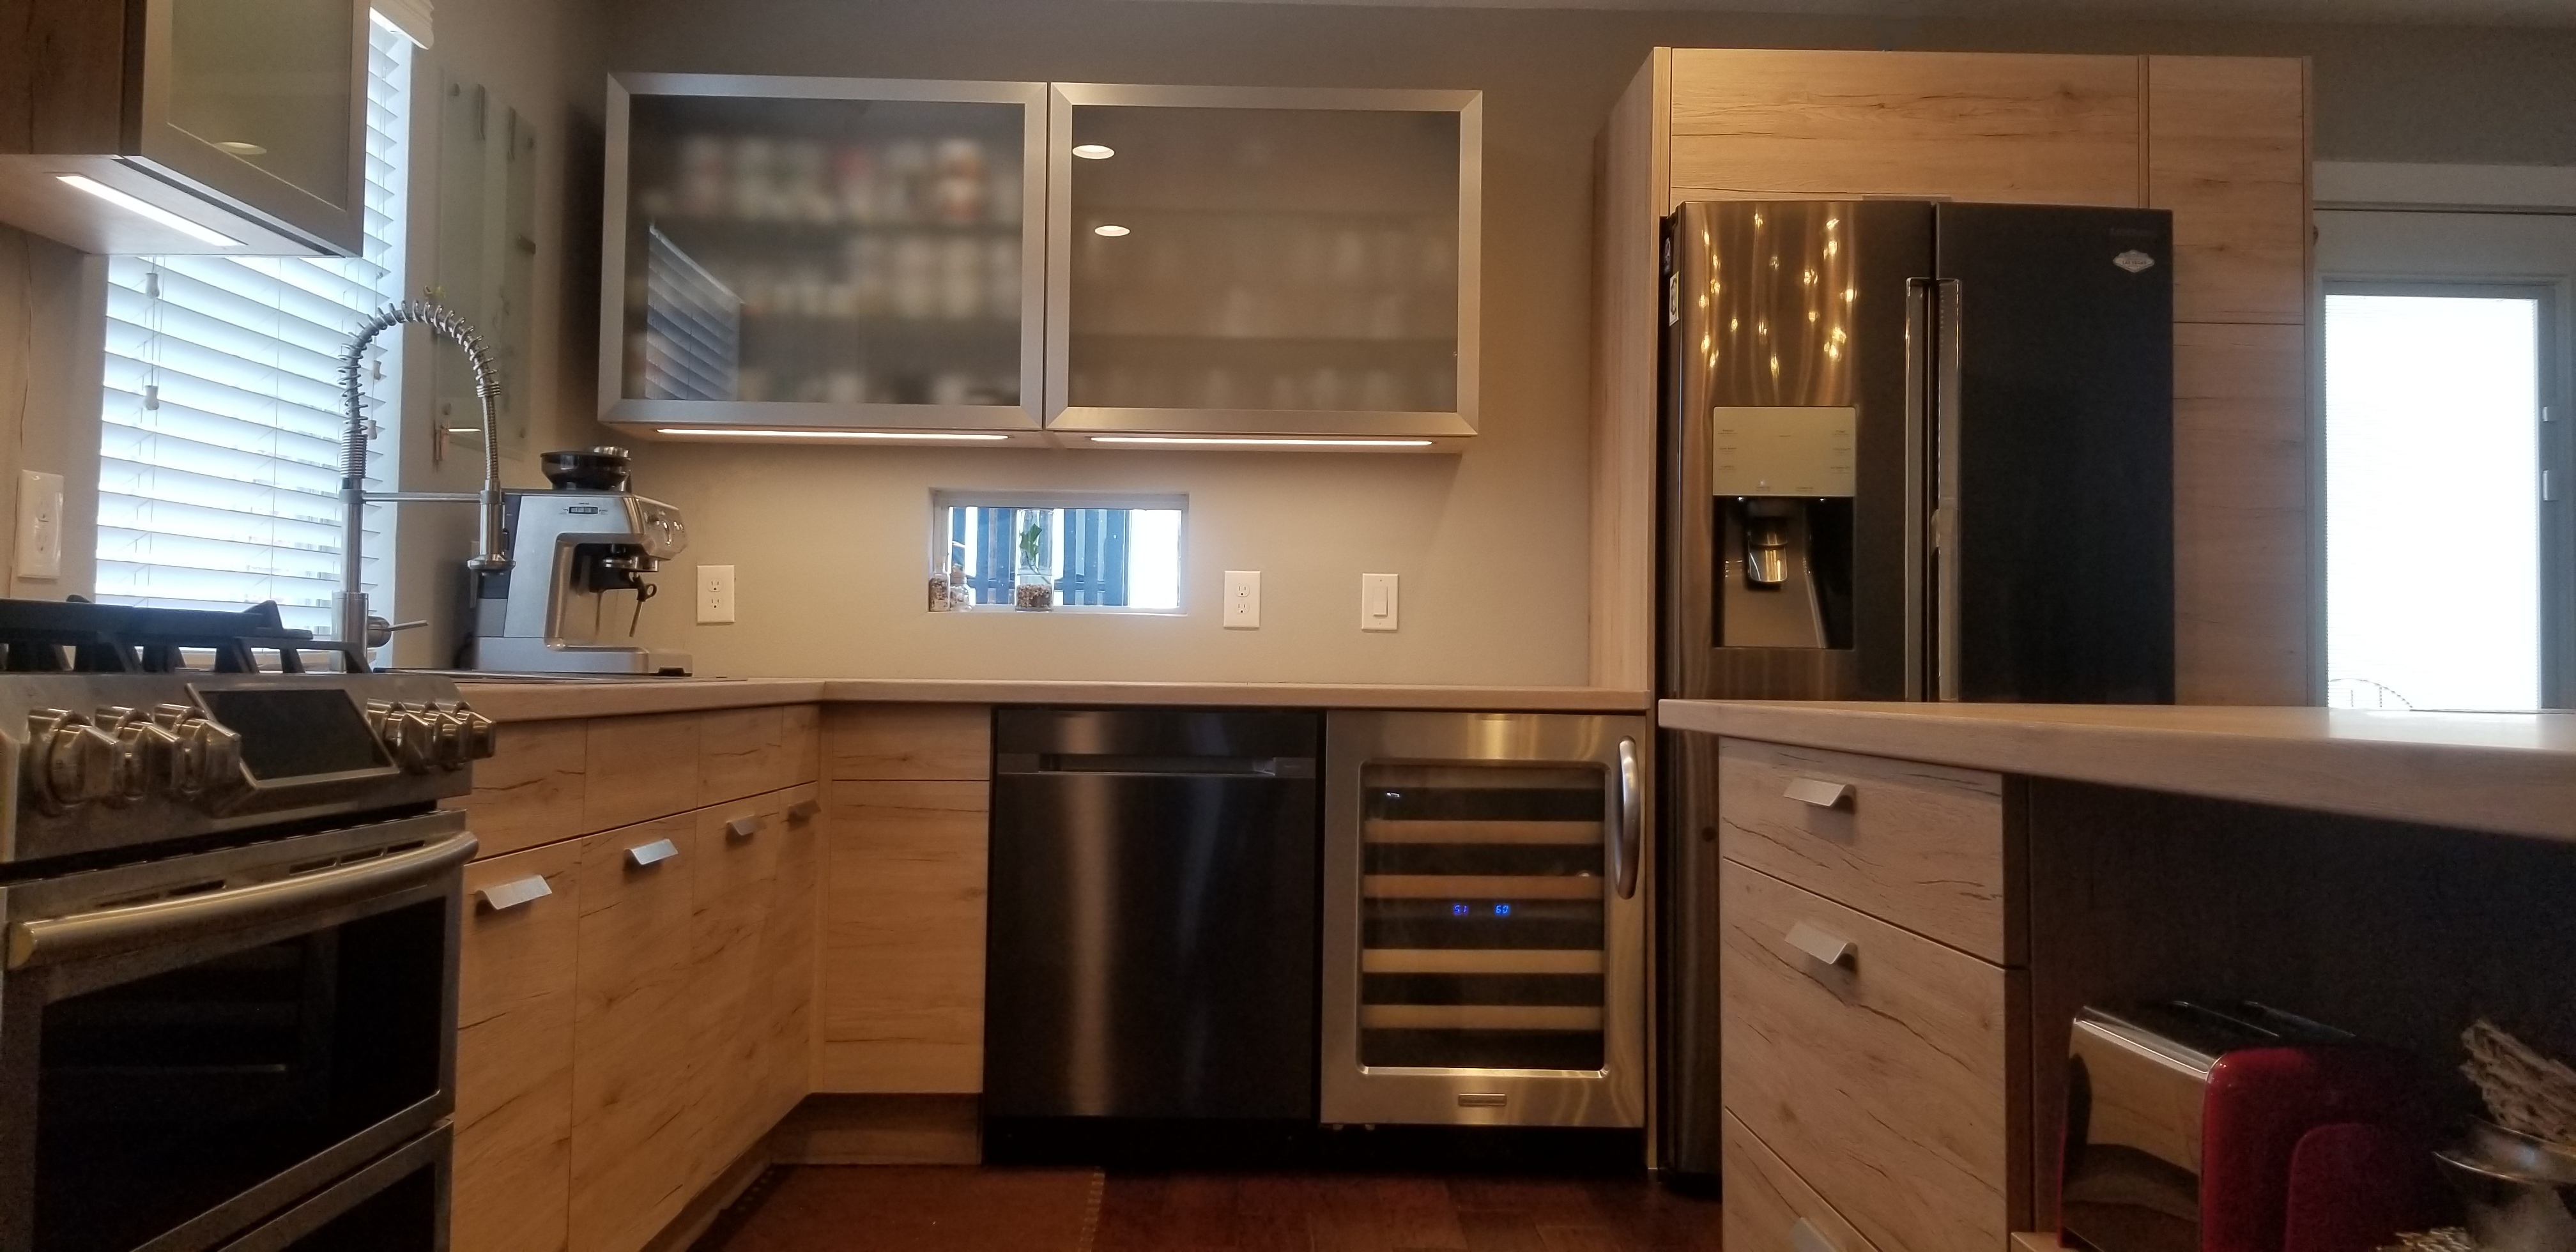 Customized German kitchens, Katy TX